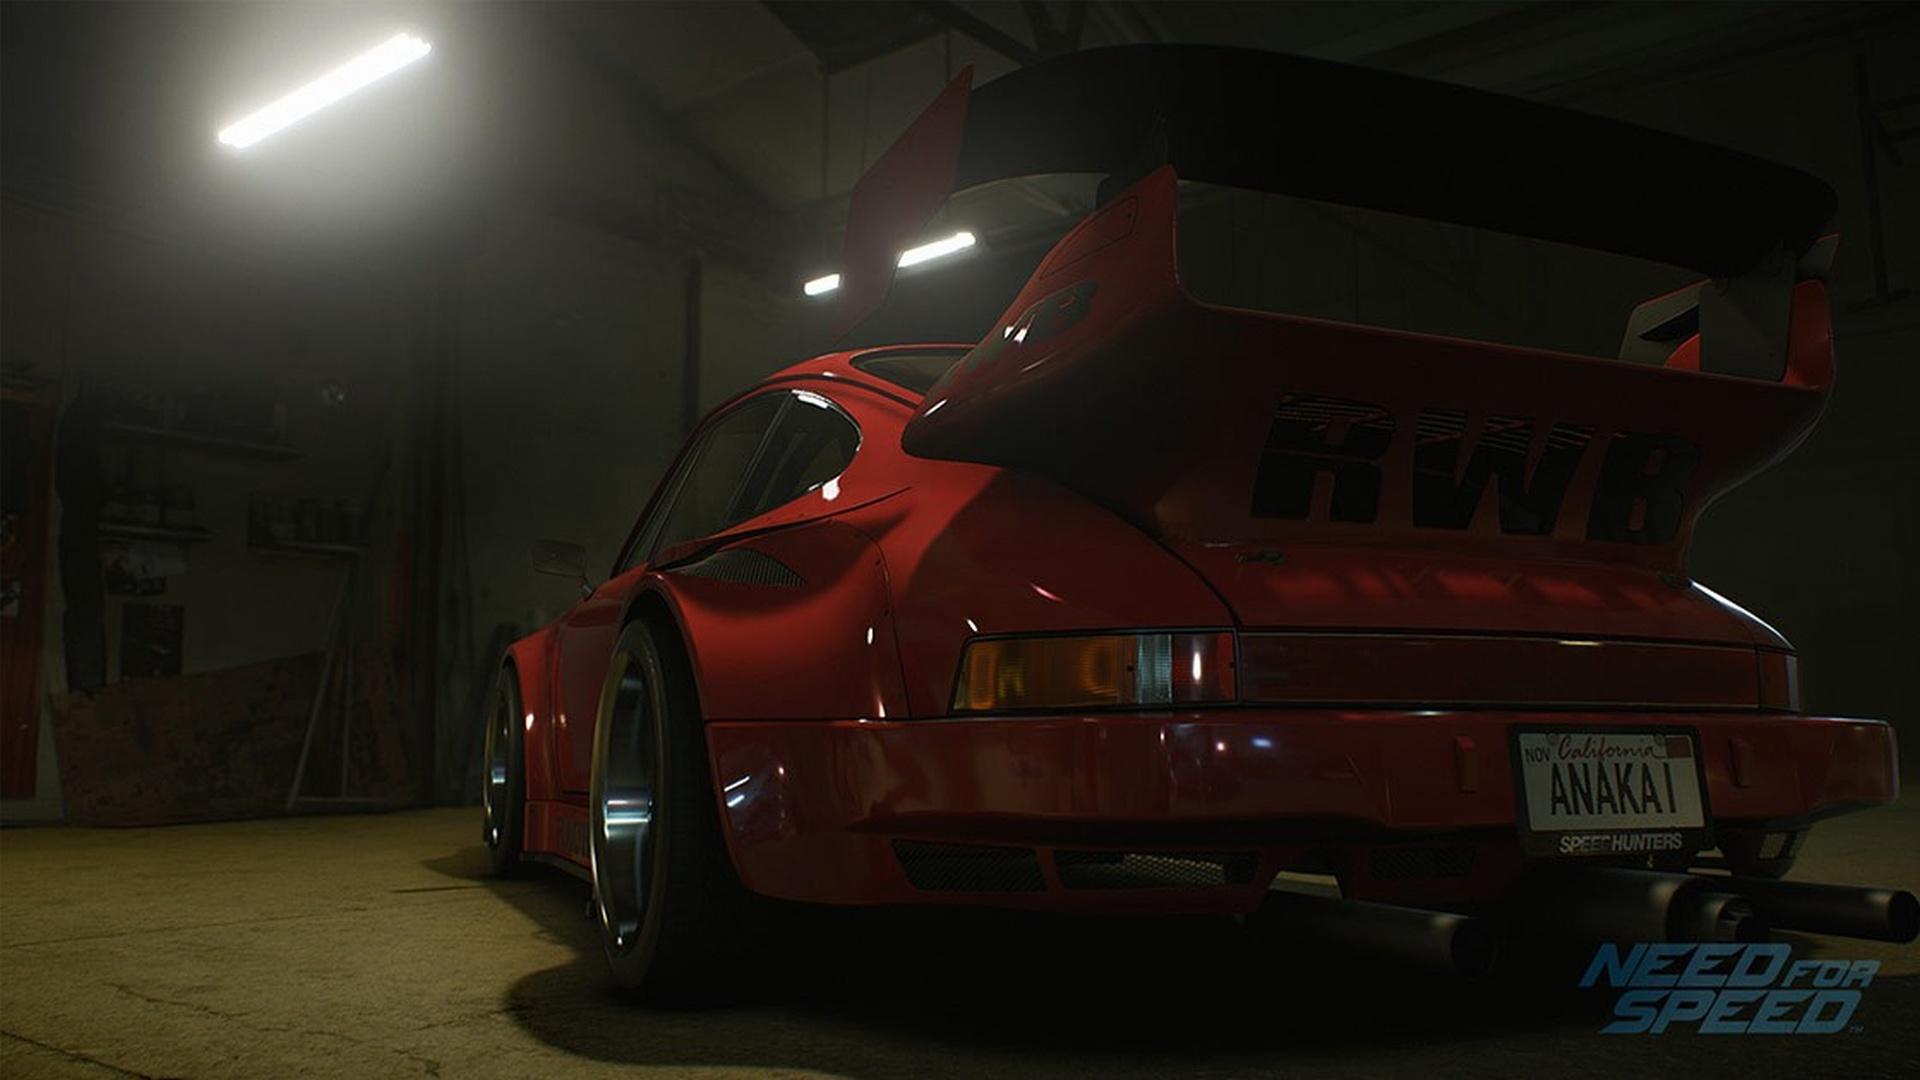 Rwb Porsche Need For Speed 2015 Styling Sticker 1329846 Hd